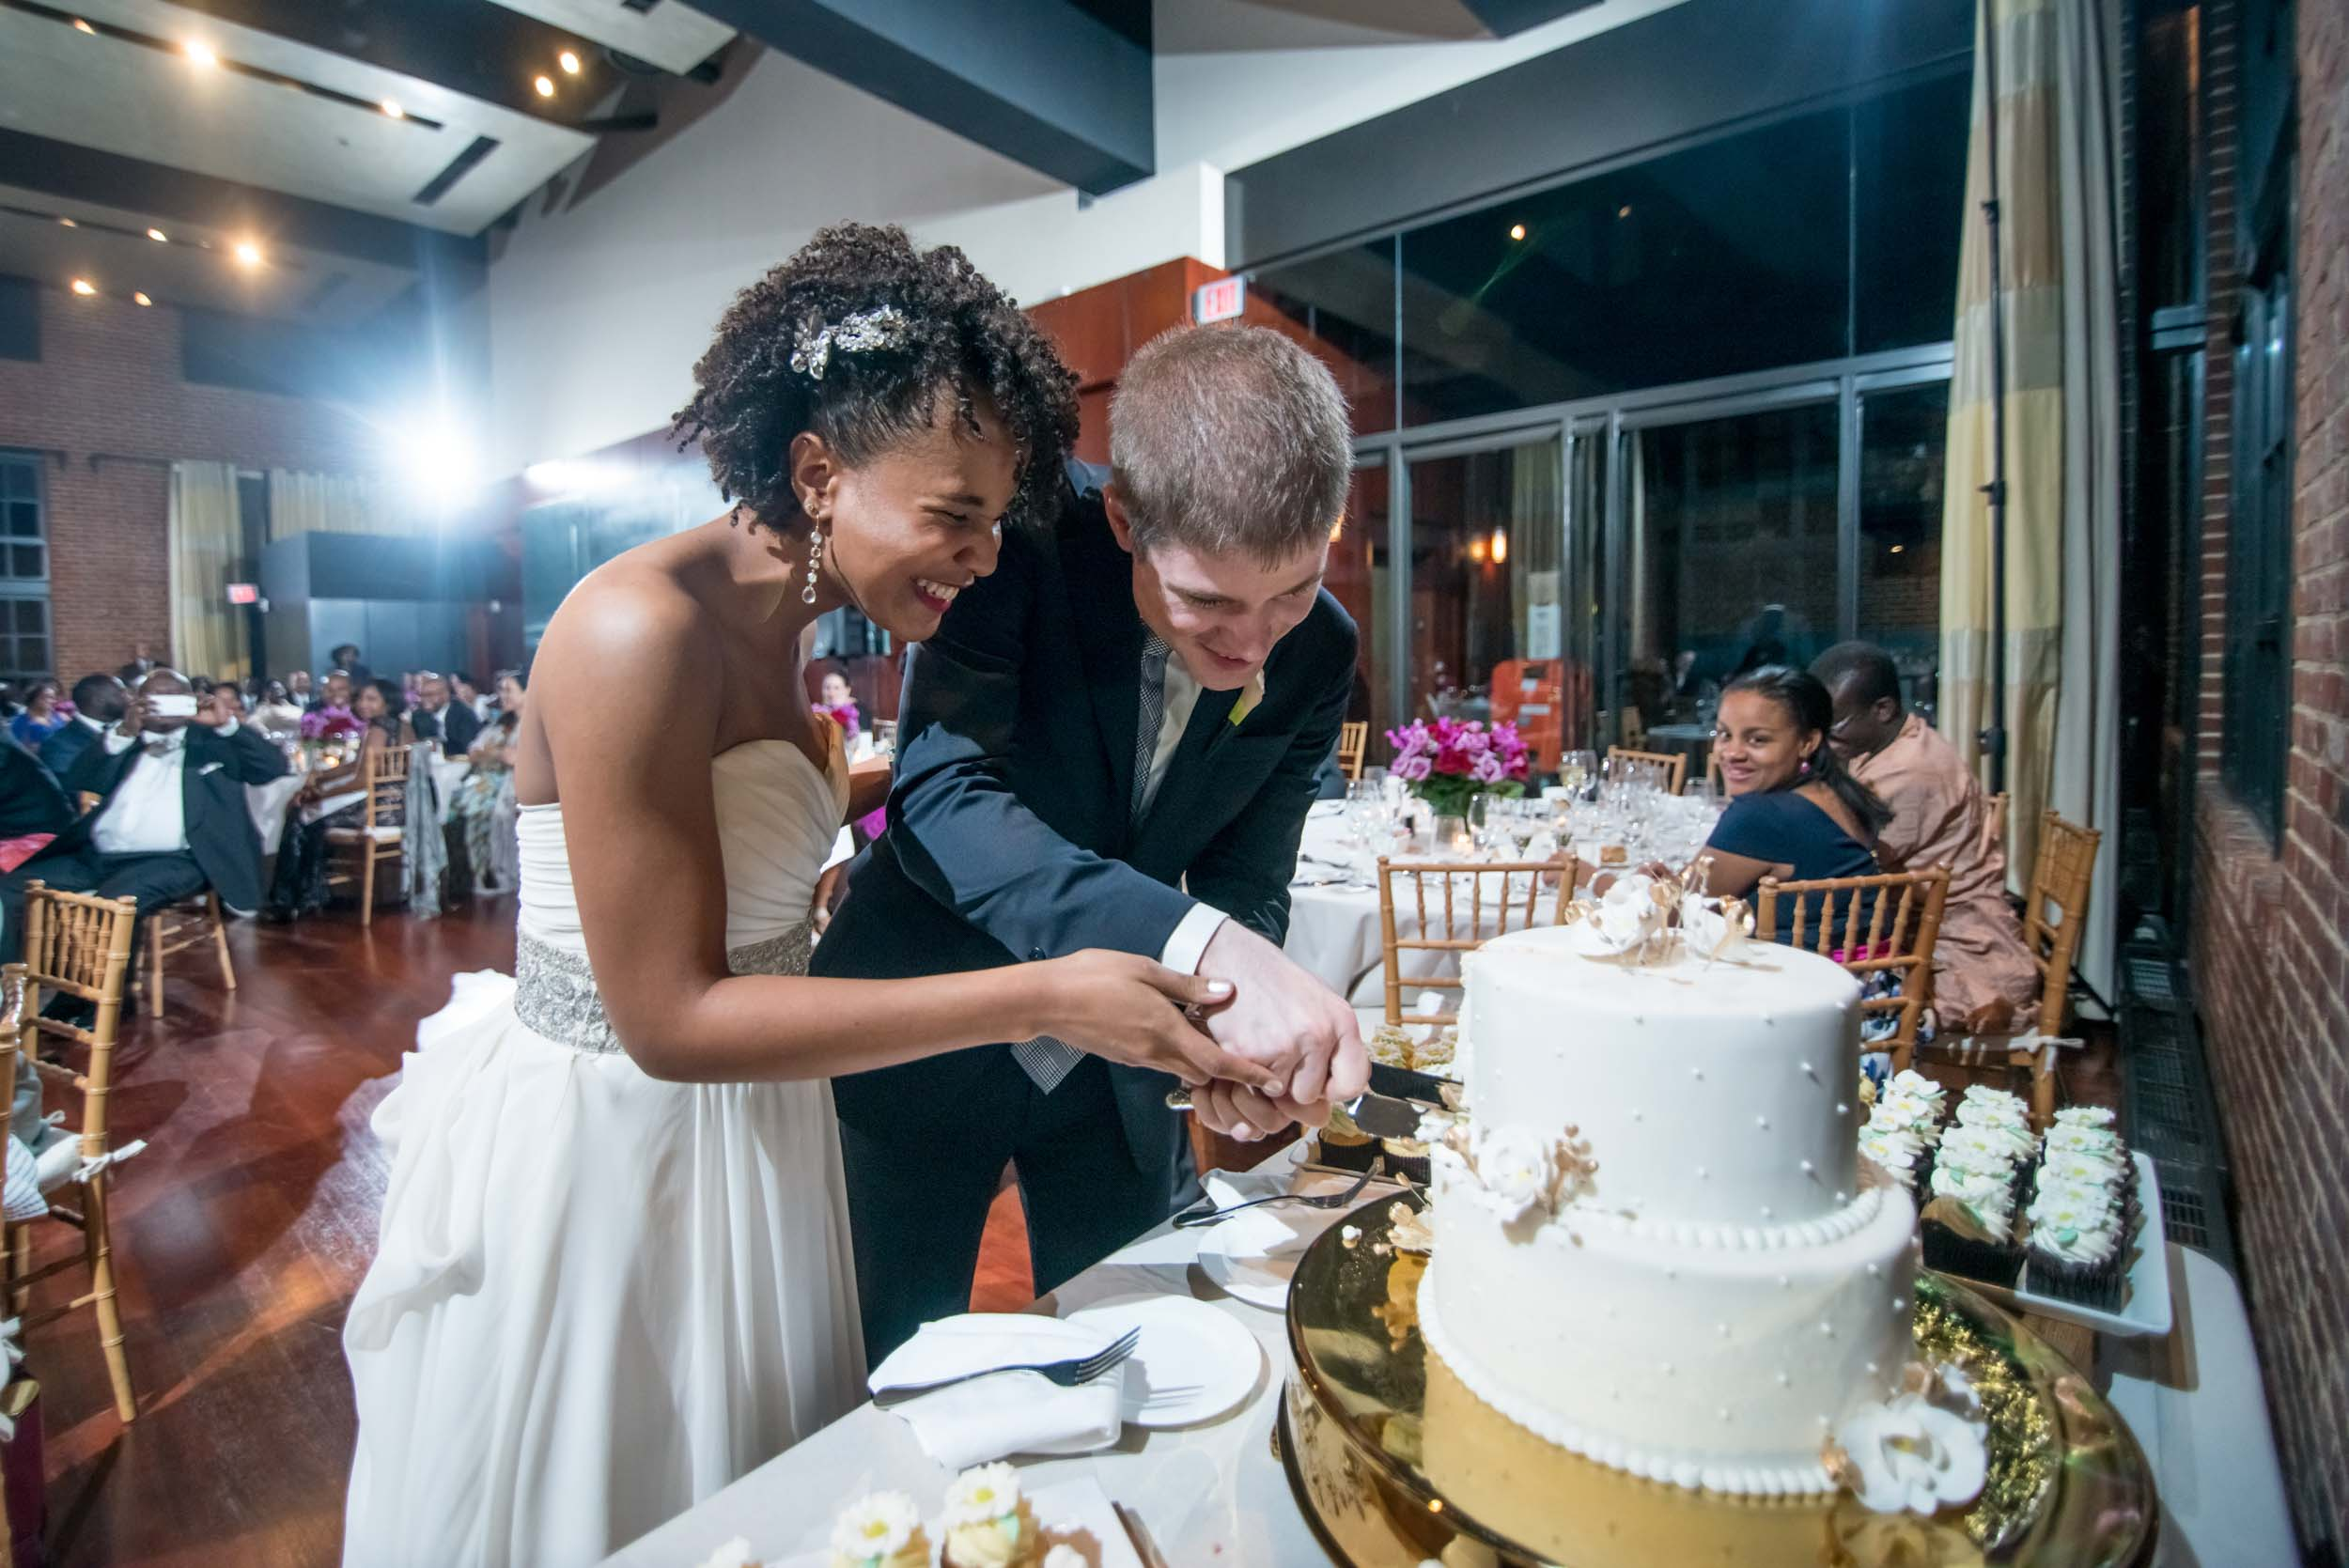 dc+metro+wedding+photographer+vadym+guliuk+photography+wedding+cake-cutting-2025.jpg